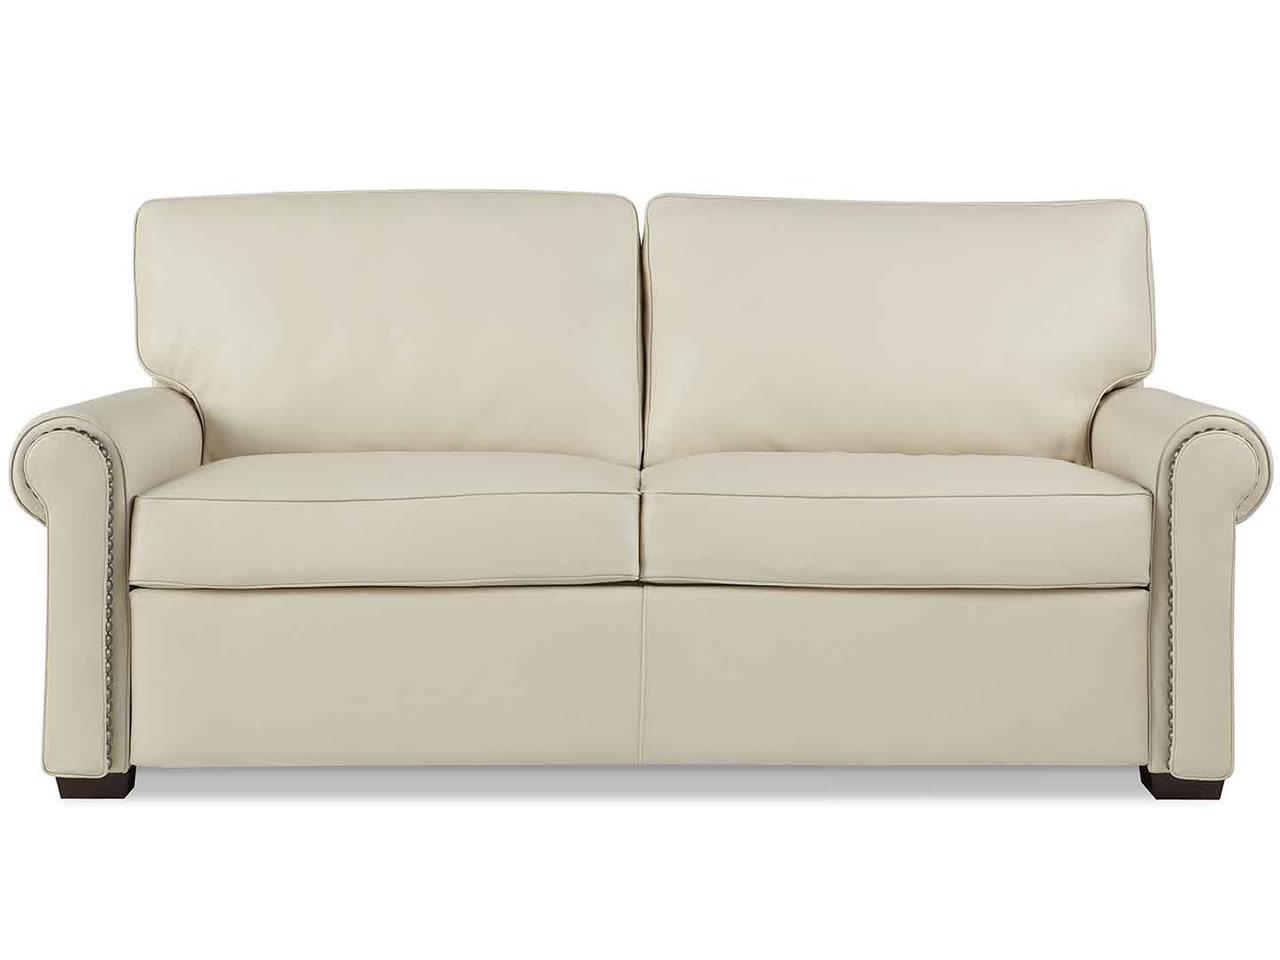 sofa and chairs bloomington mn es una palabra aguda reese sleeper sofas of minnesota